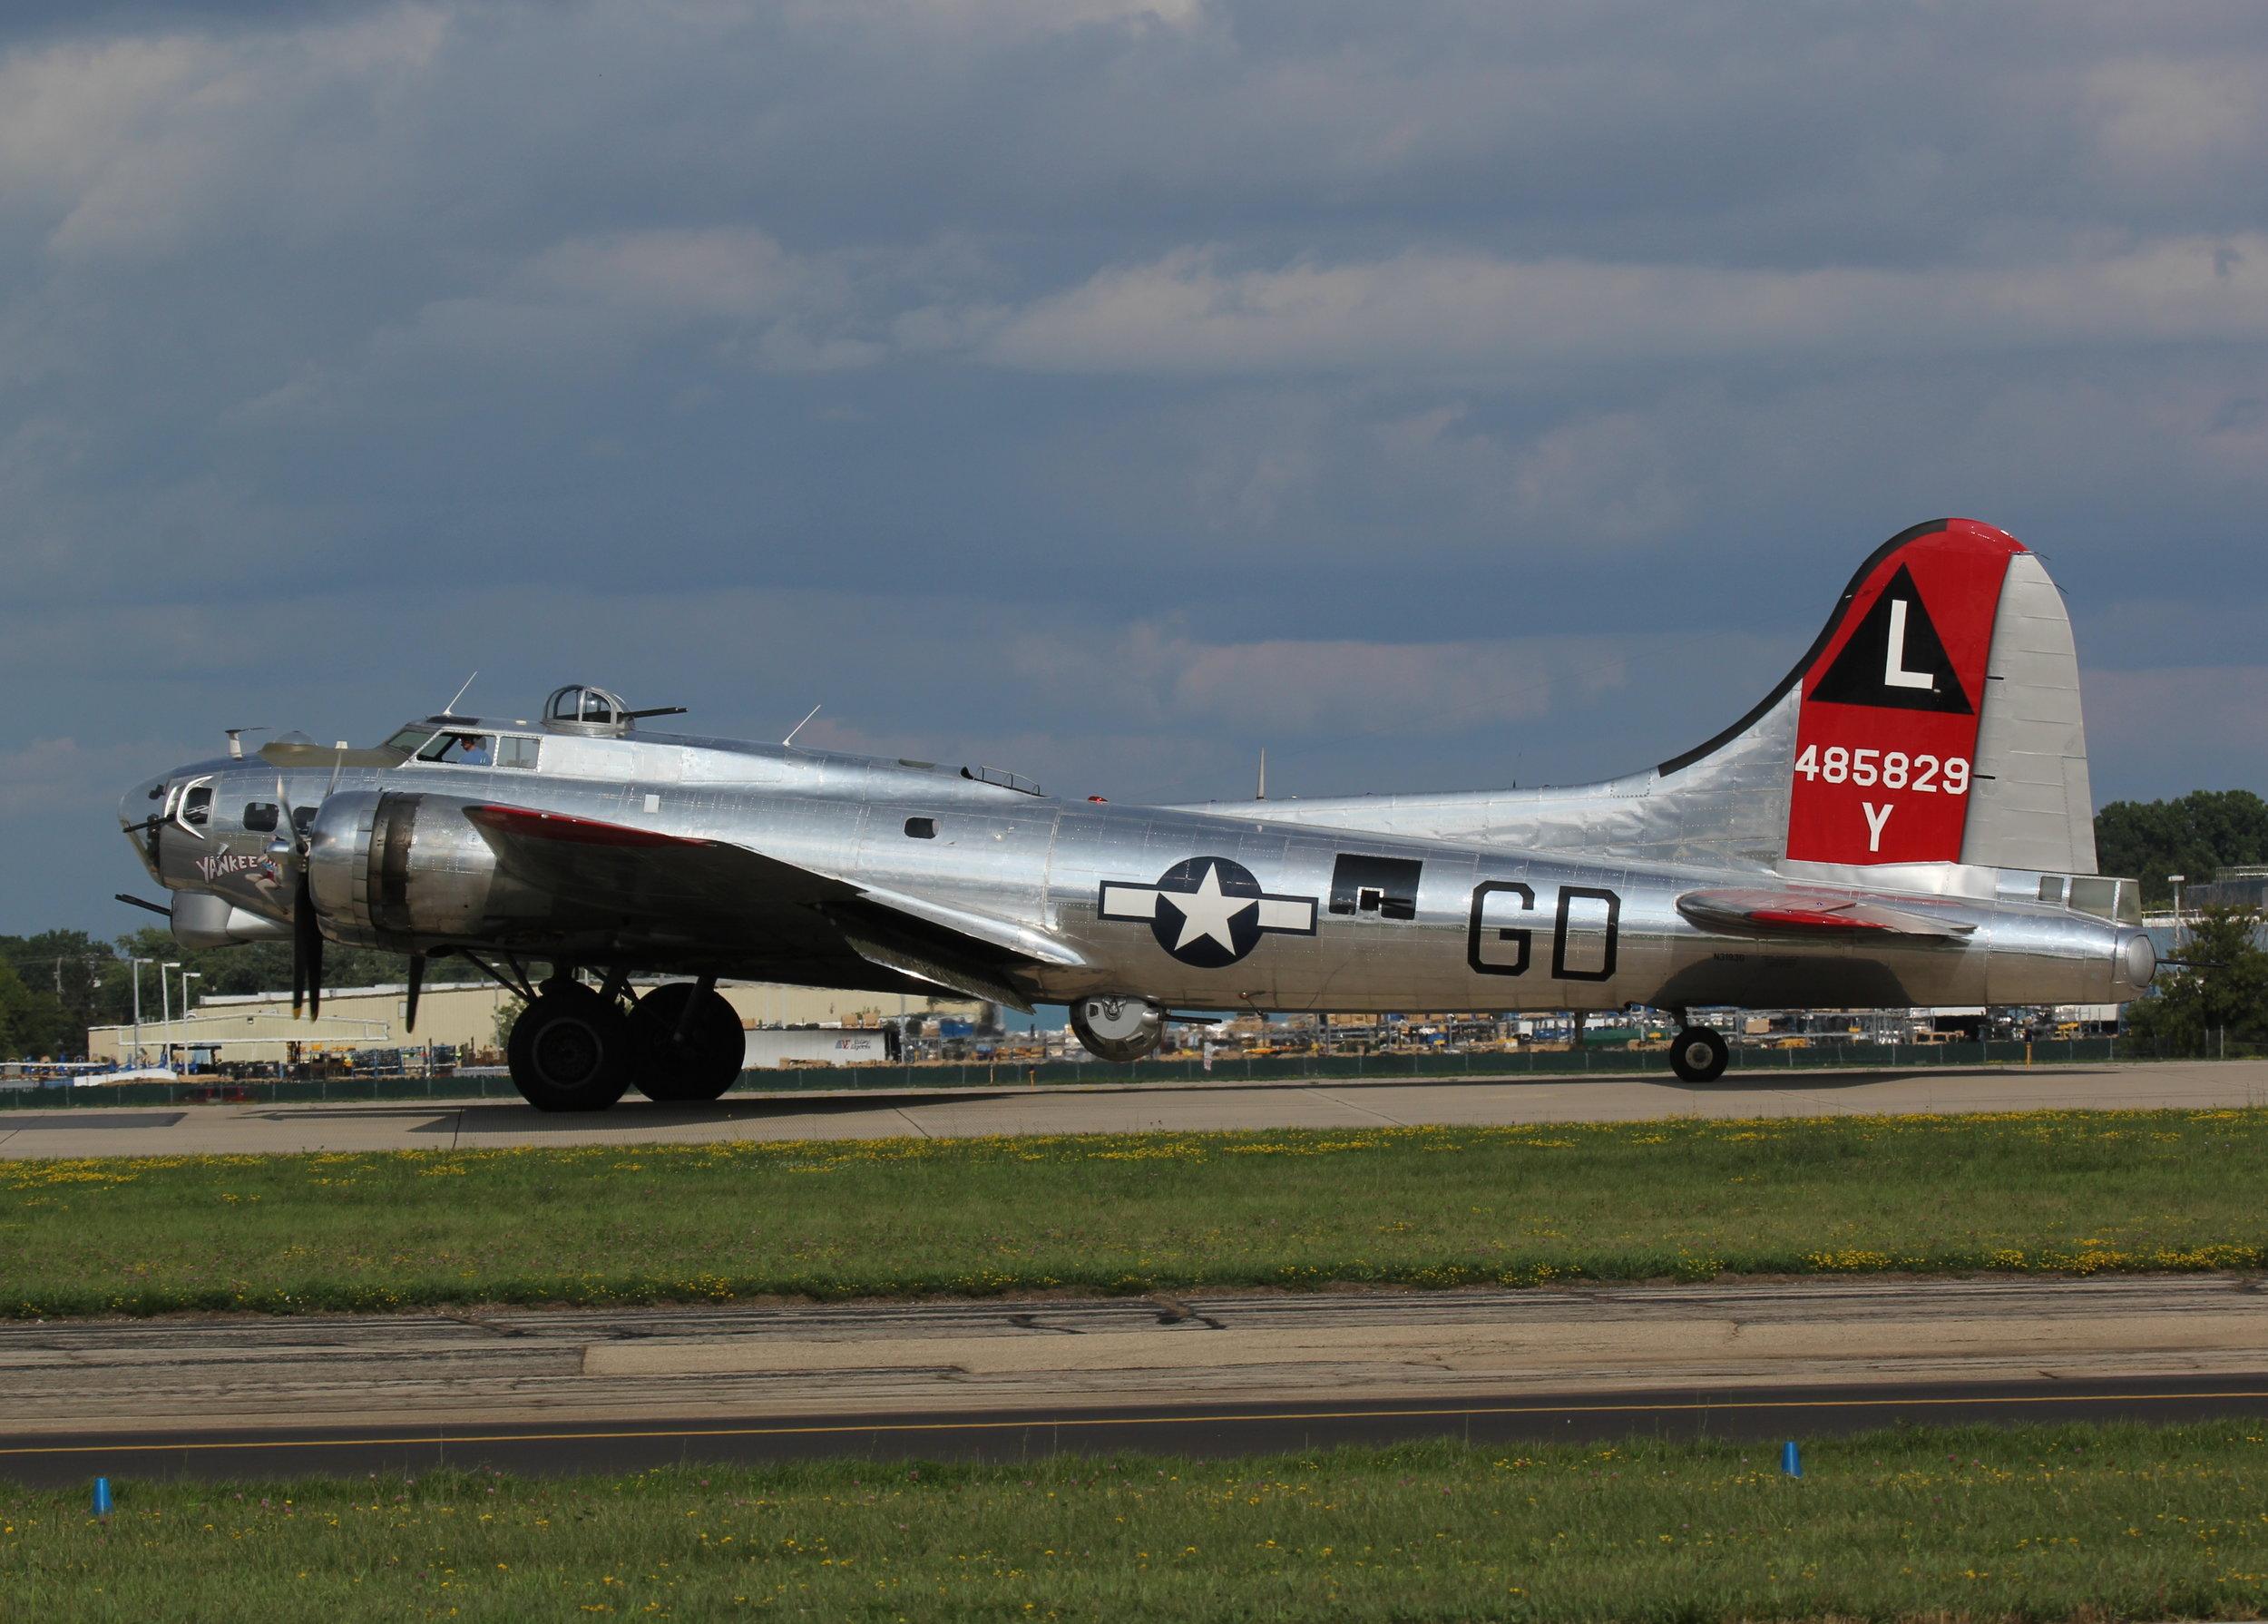 N3193G (485829) B-17G Flying Fortress taxiing at Oshkosh 24th July 2018 by Alec Rankin